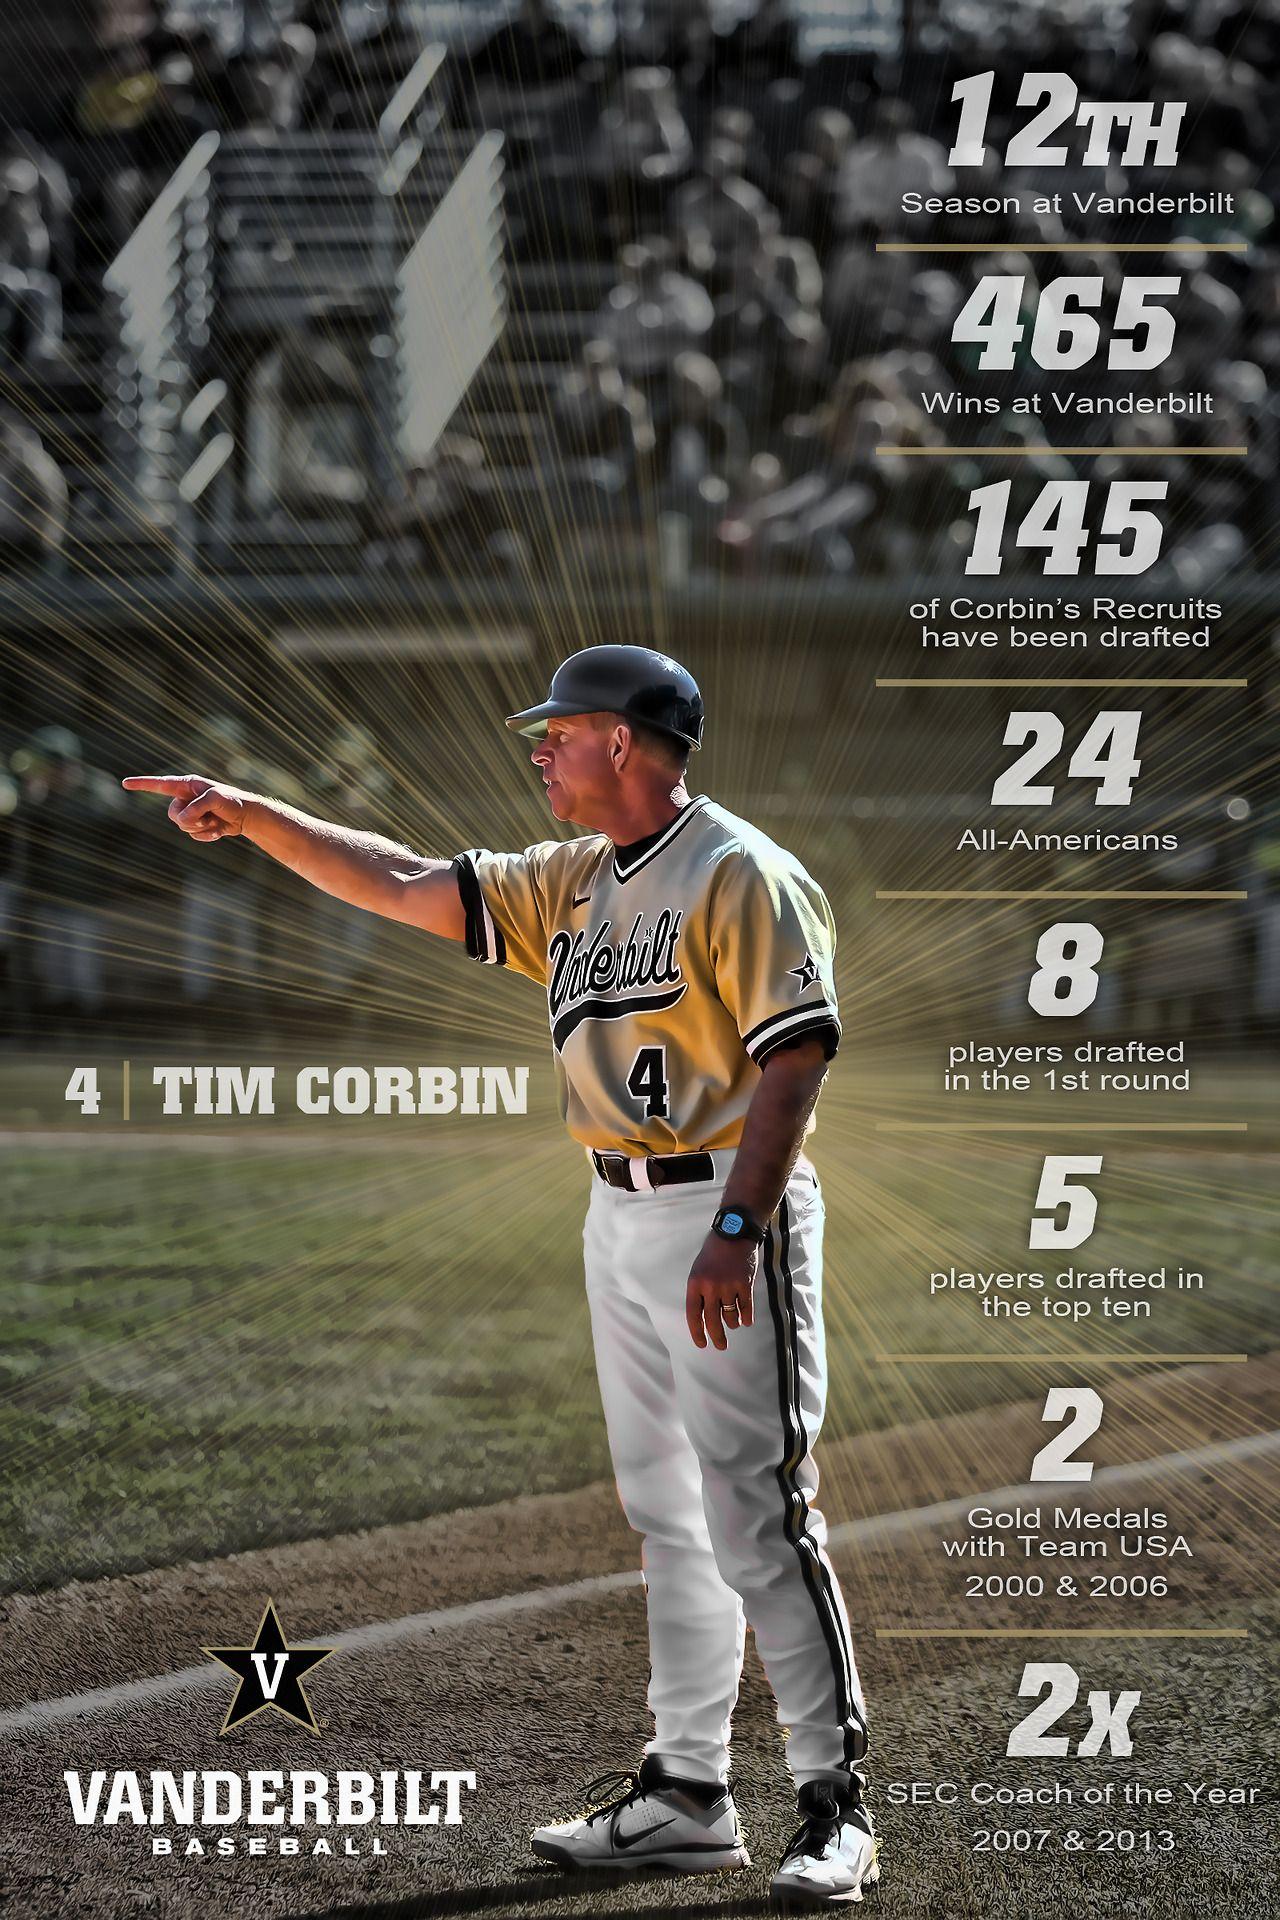 Vanderbilt Baseball Graphic Highlighting The Achievements Of Their Head Baseball Coach Tim Corbin Sports Marketing College Baseball Coach Of The Year